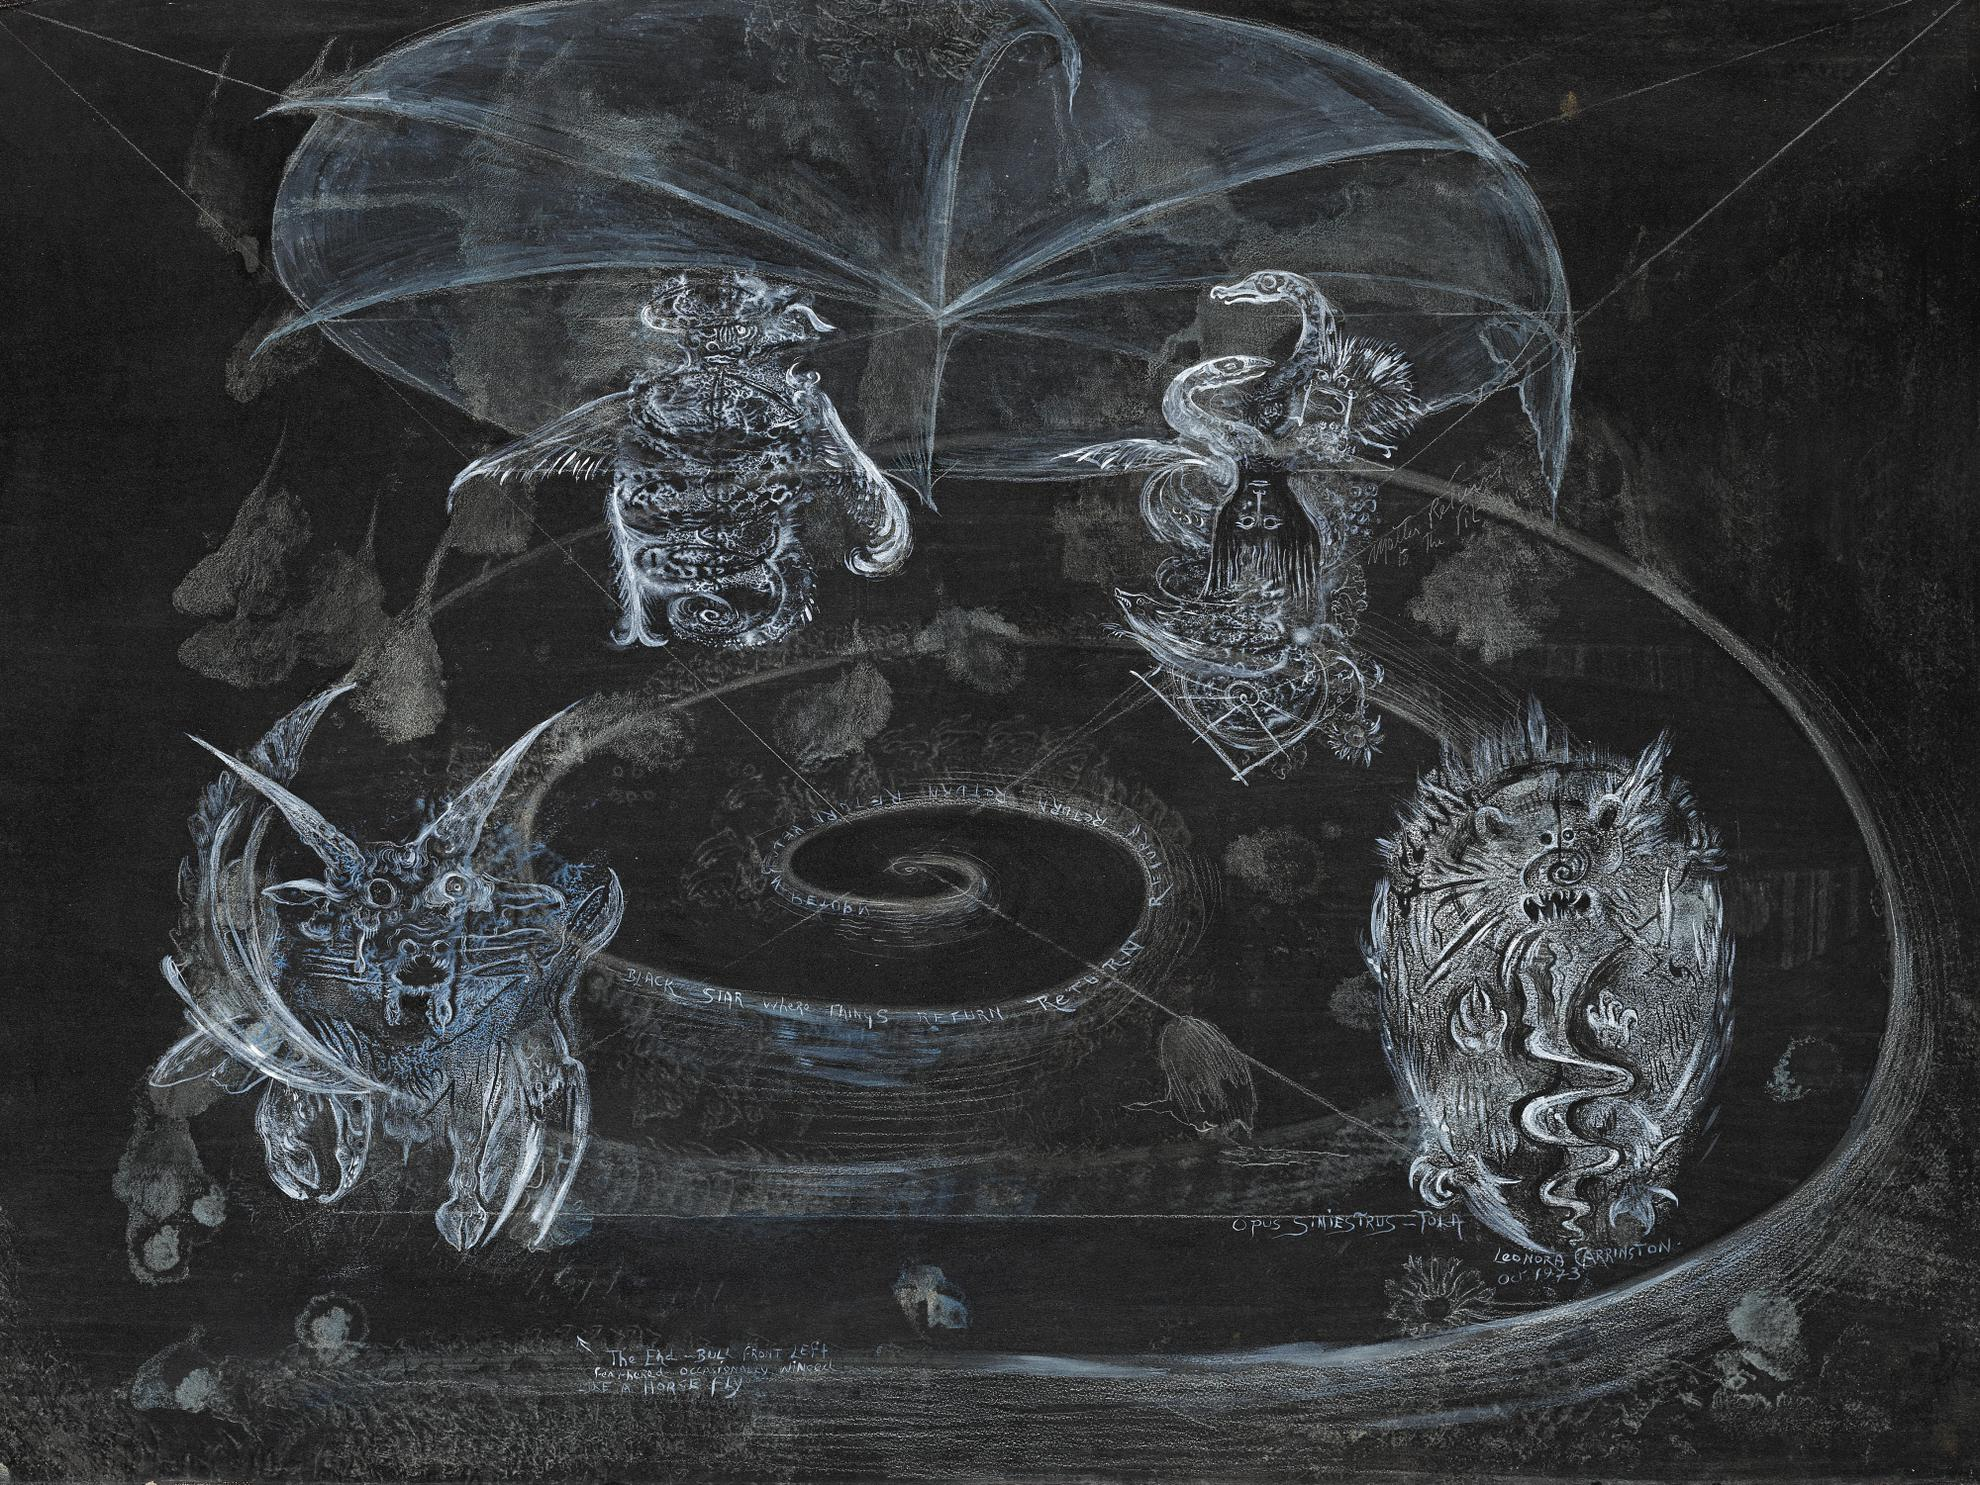 Leonora Carrington-Opus Siniestrus-Tola-1973